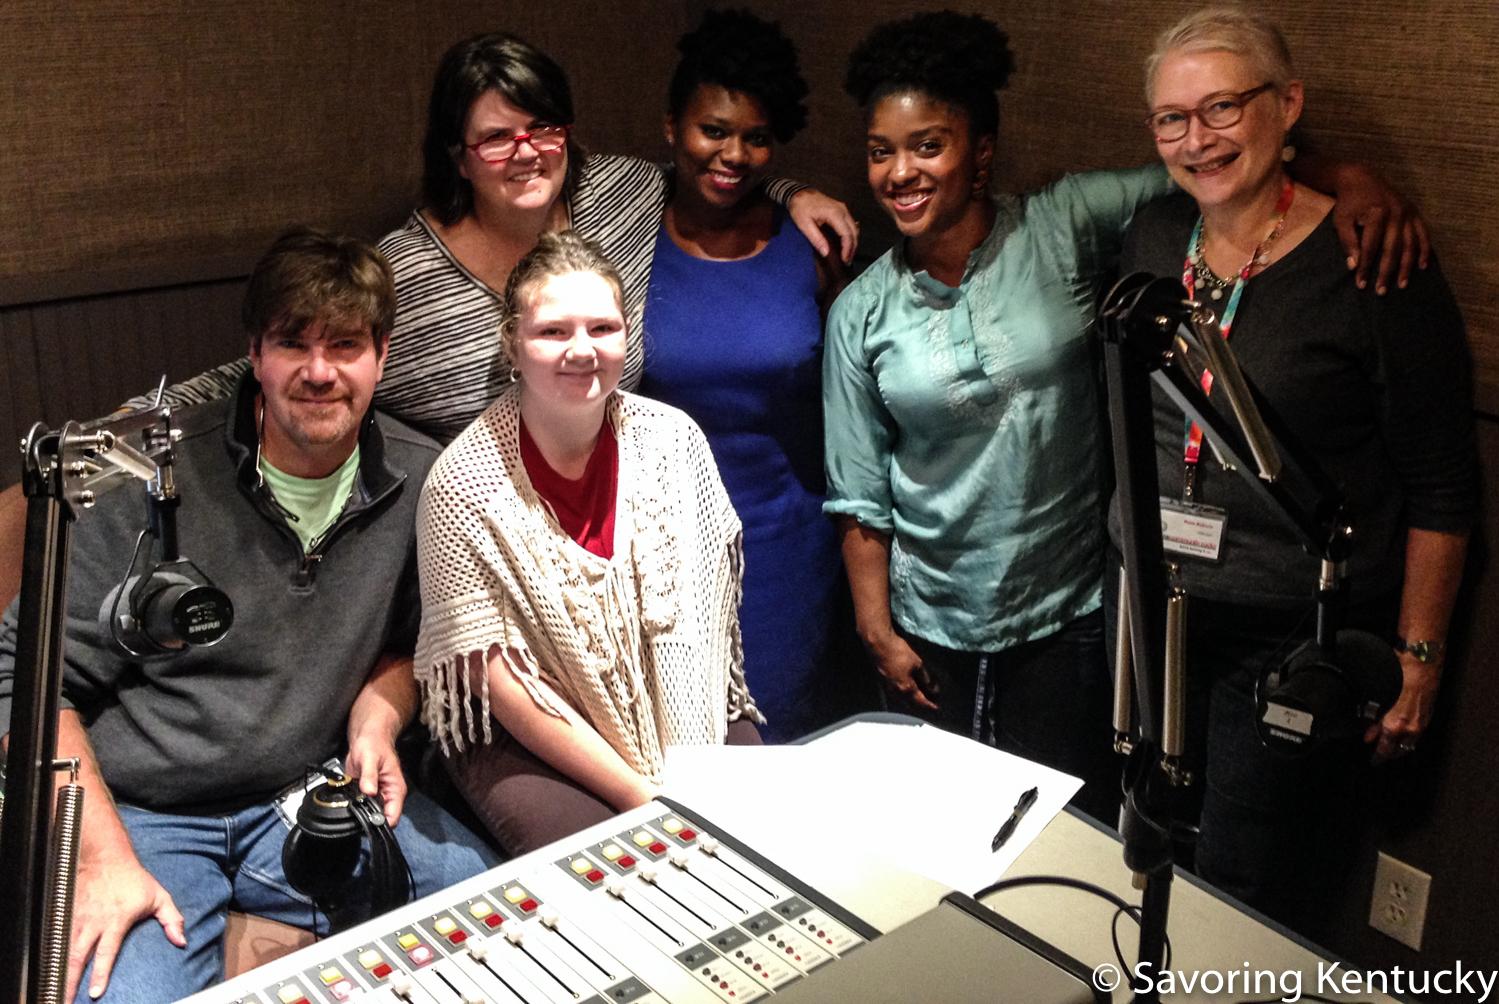 From left, Chris Michel, Ouita Michel, Willa Michel, Ashley Smith, Lacreesha Berry, Rona Roberts